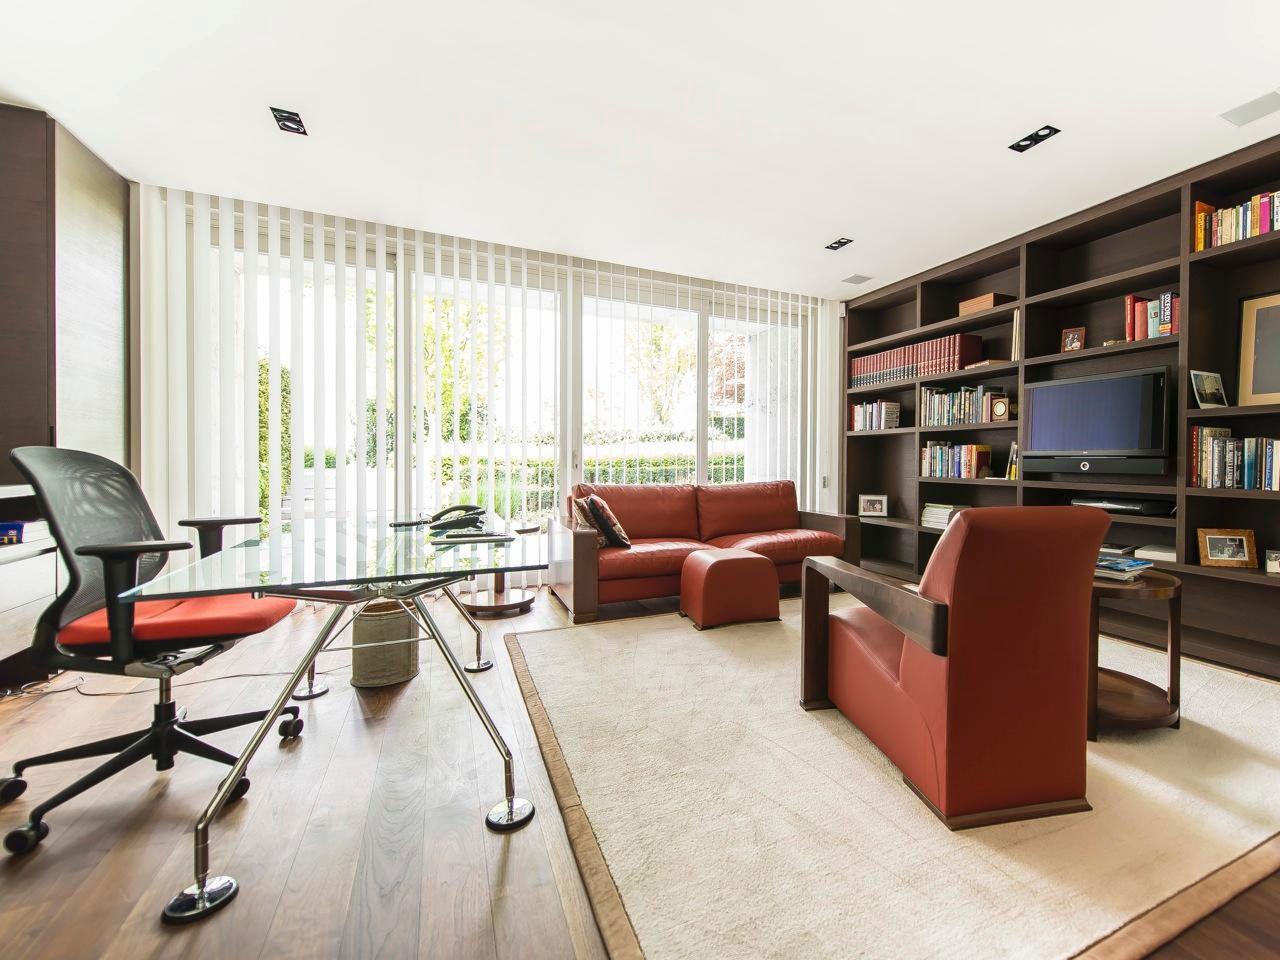 Chic Elegant Apartment in Brussels With Bright Interiors-21